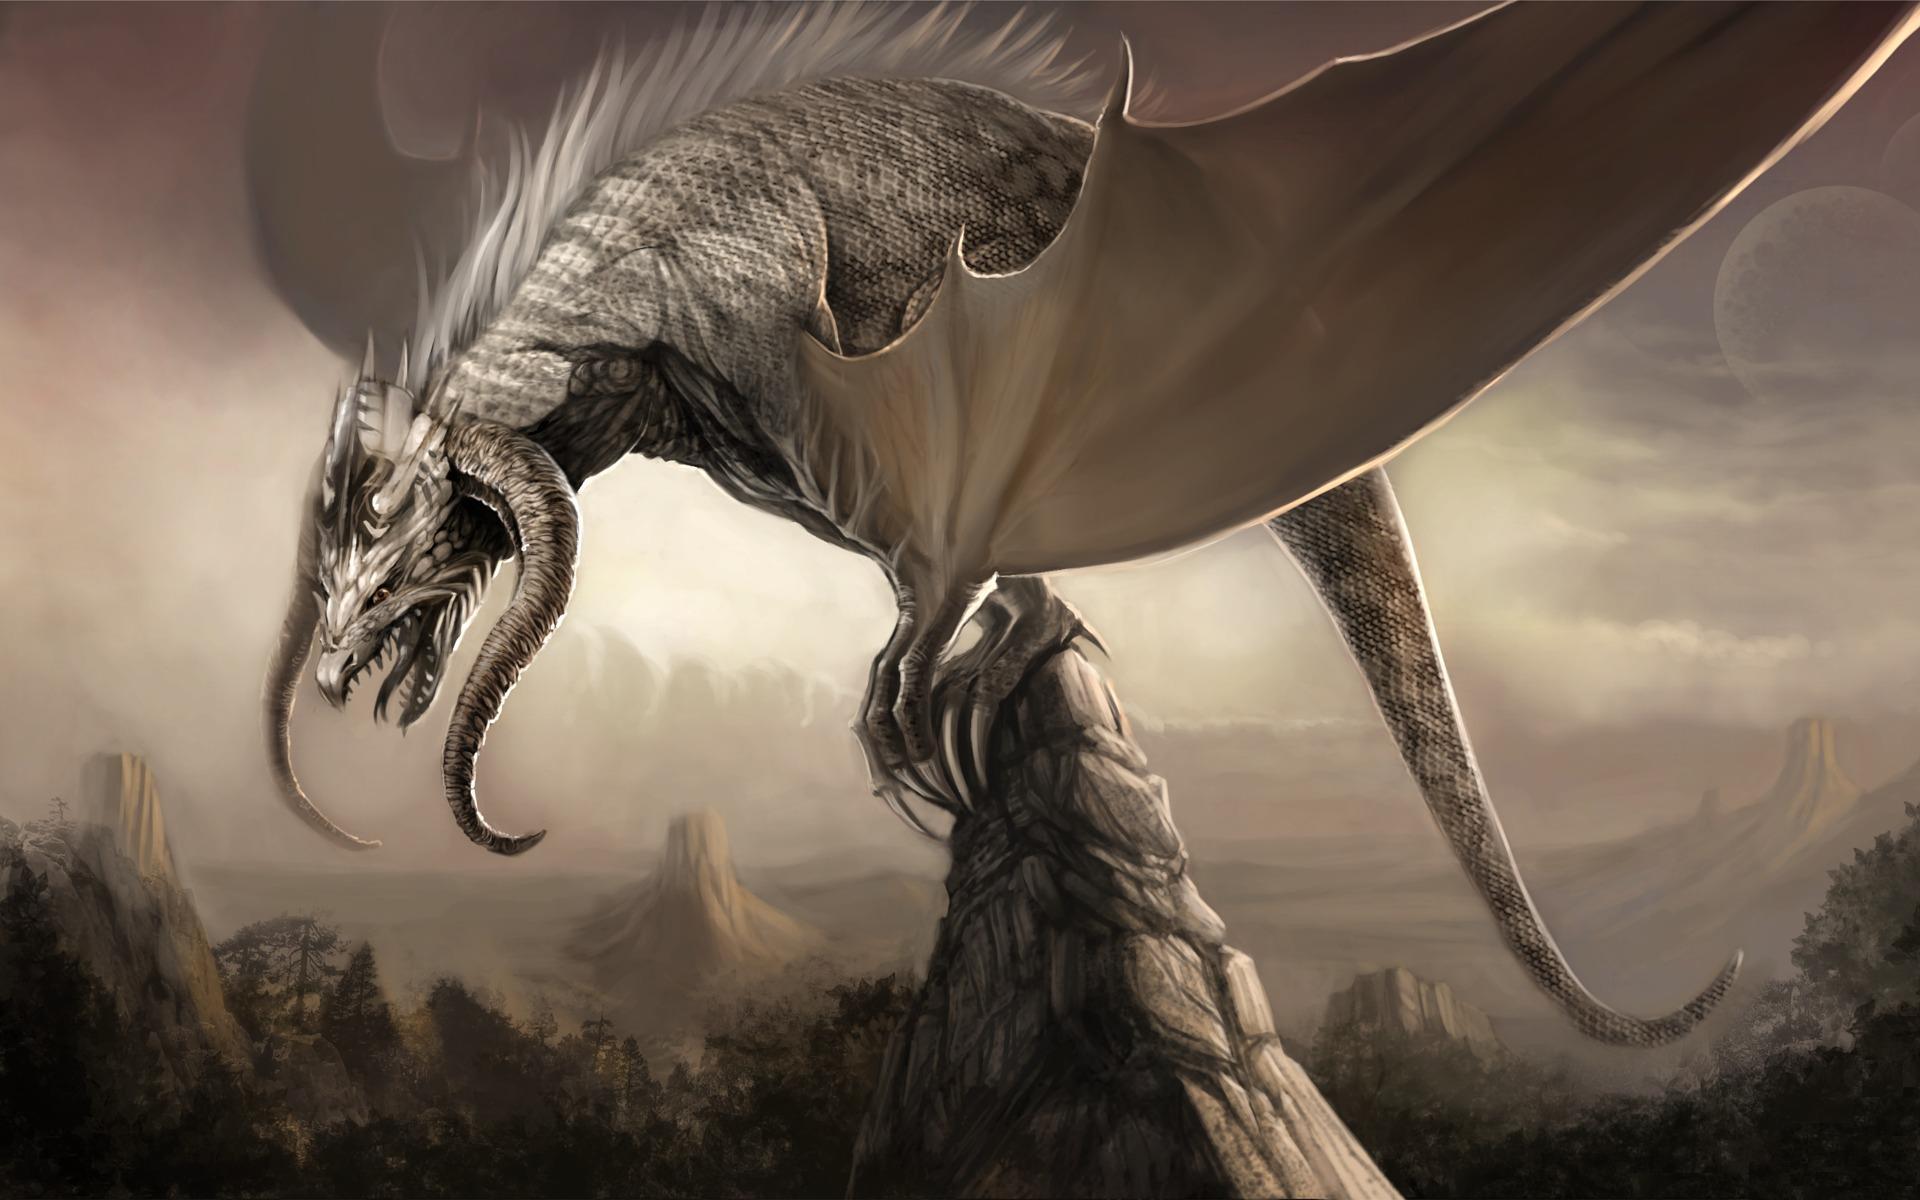 Basik ru обои на рабочий стол драконы